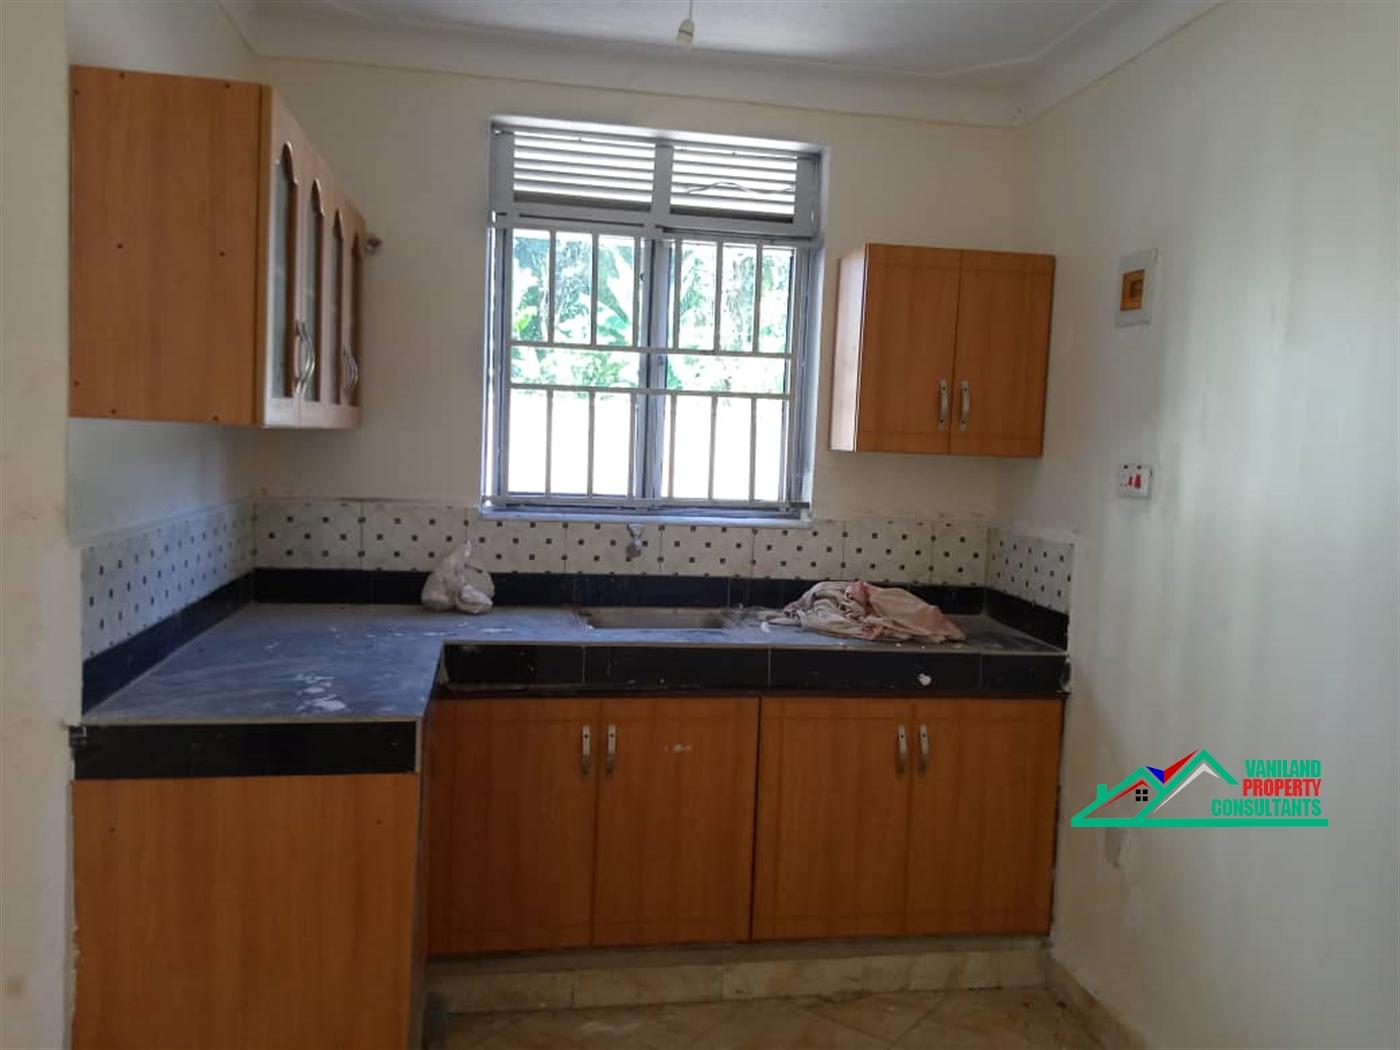 Apartment block for sale in Kyaliwajjala Wakiso